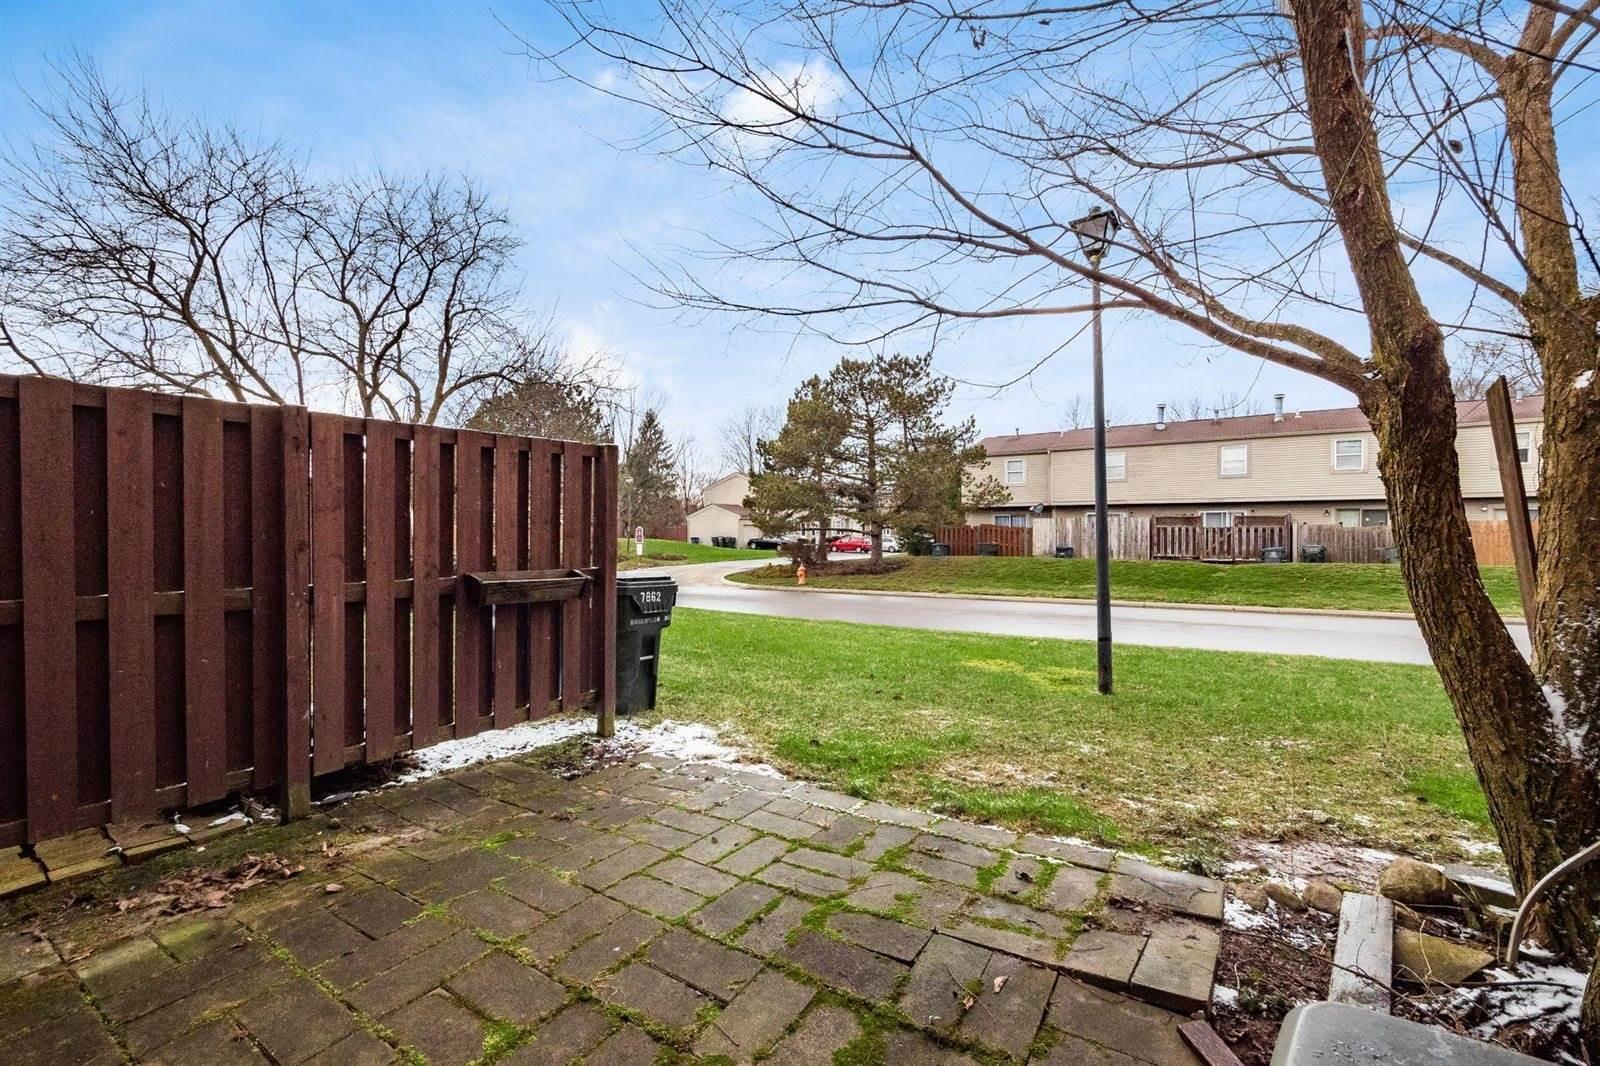 7862 Barkwood Drive, #17C, Worthington, OH 43085